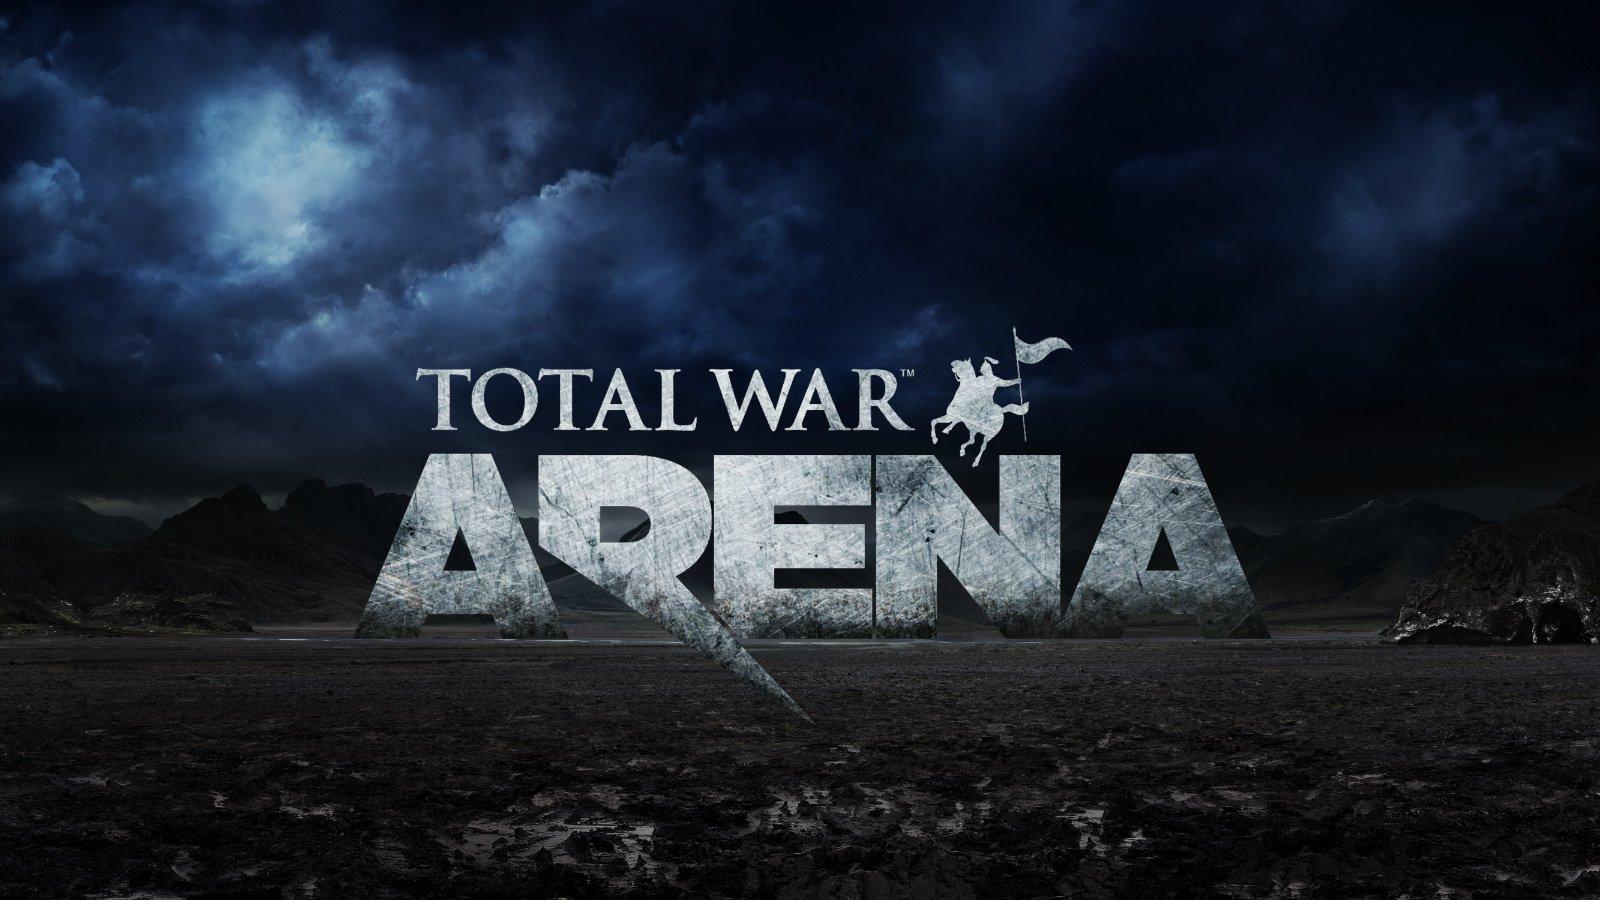 Total War: Arena, Free-to-Play игра от Creative Assembly.Во время своей сессии, на GDC 2013 в Сан-Франциско сегодня, ... - Изображение 1